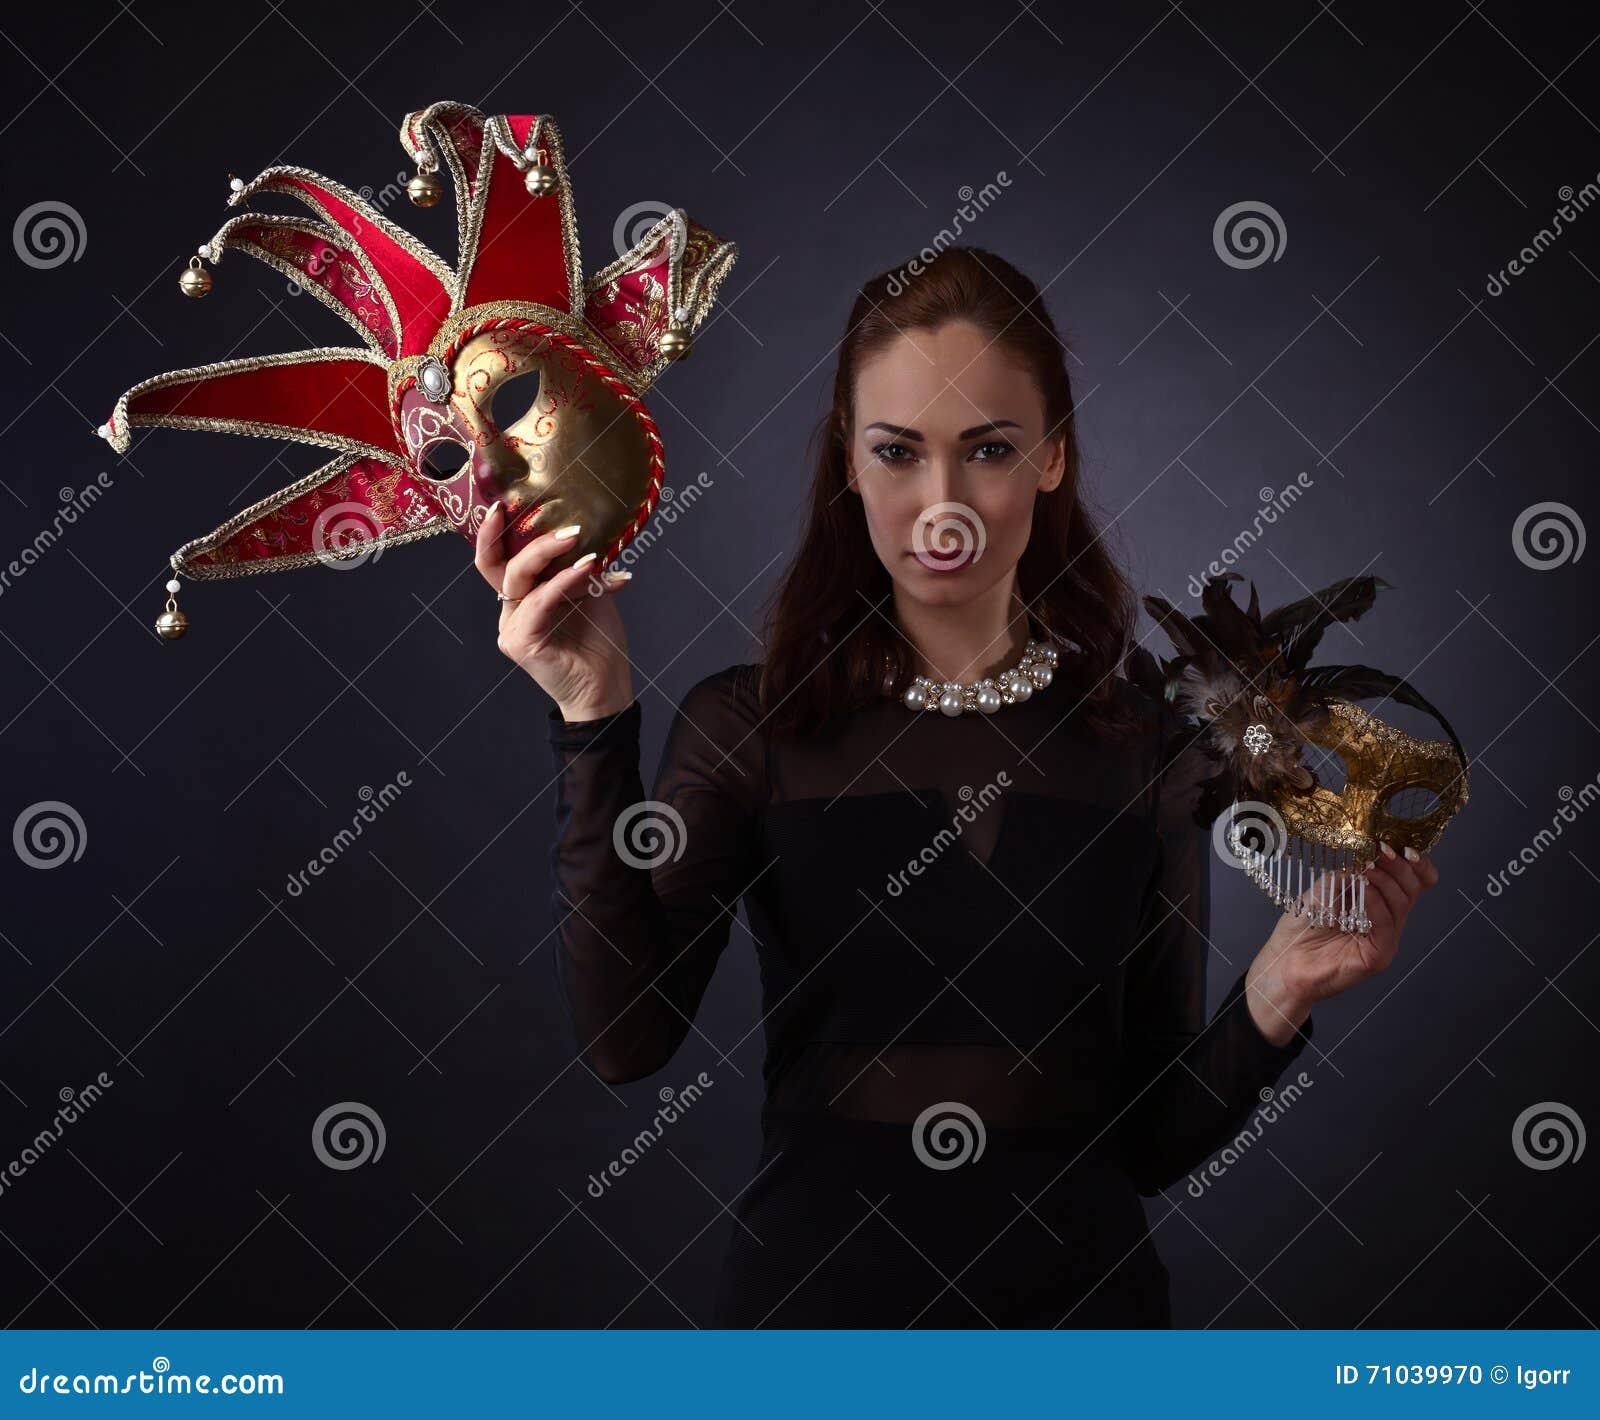 mulher-bonita-com-mscara-do-carnaval-71039970.jpg